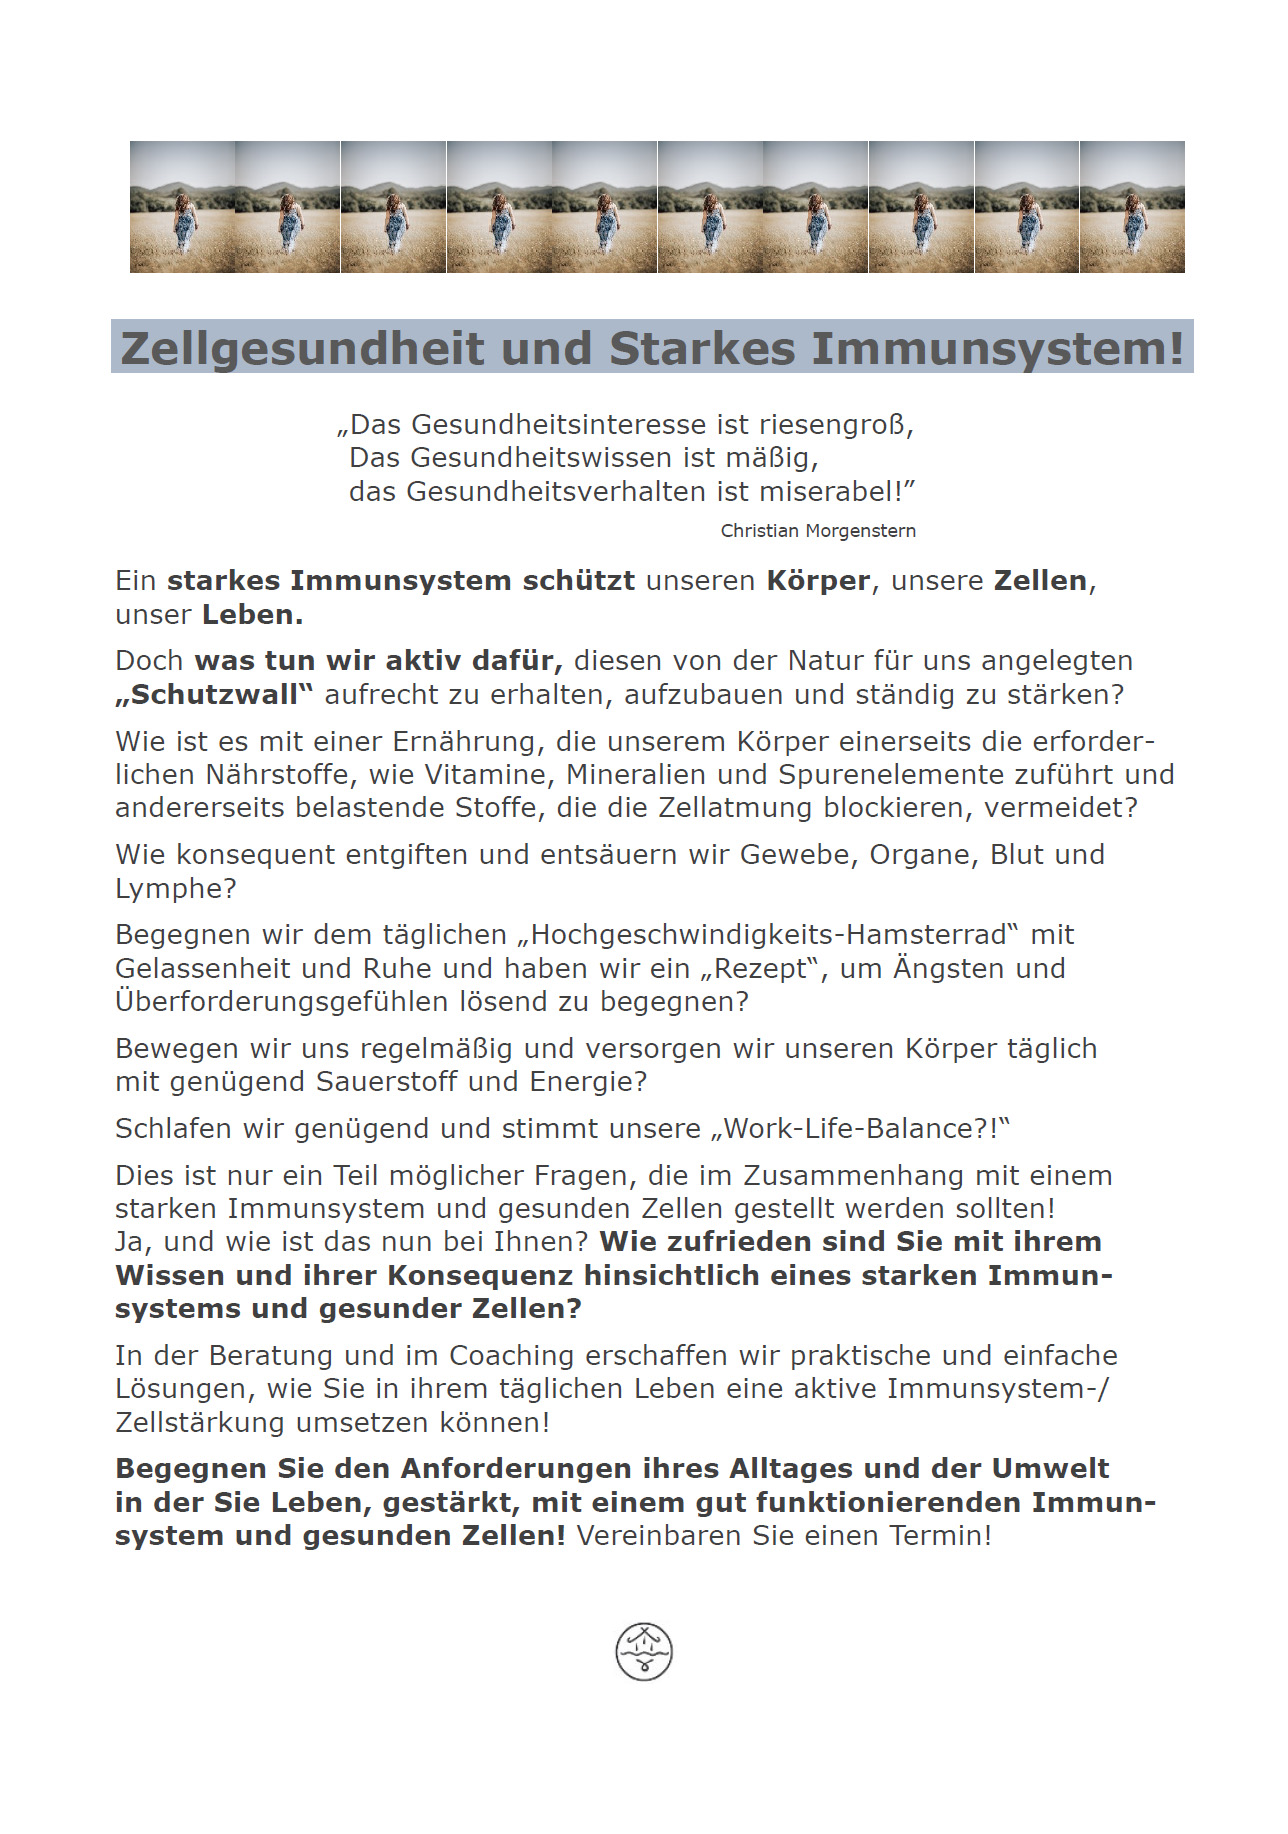 Zellgesundheit - Starkes Immunsystem